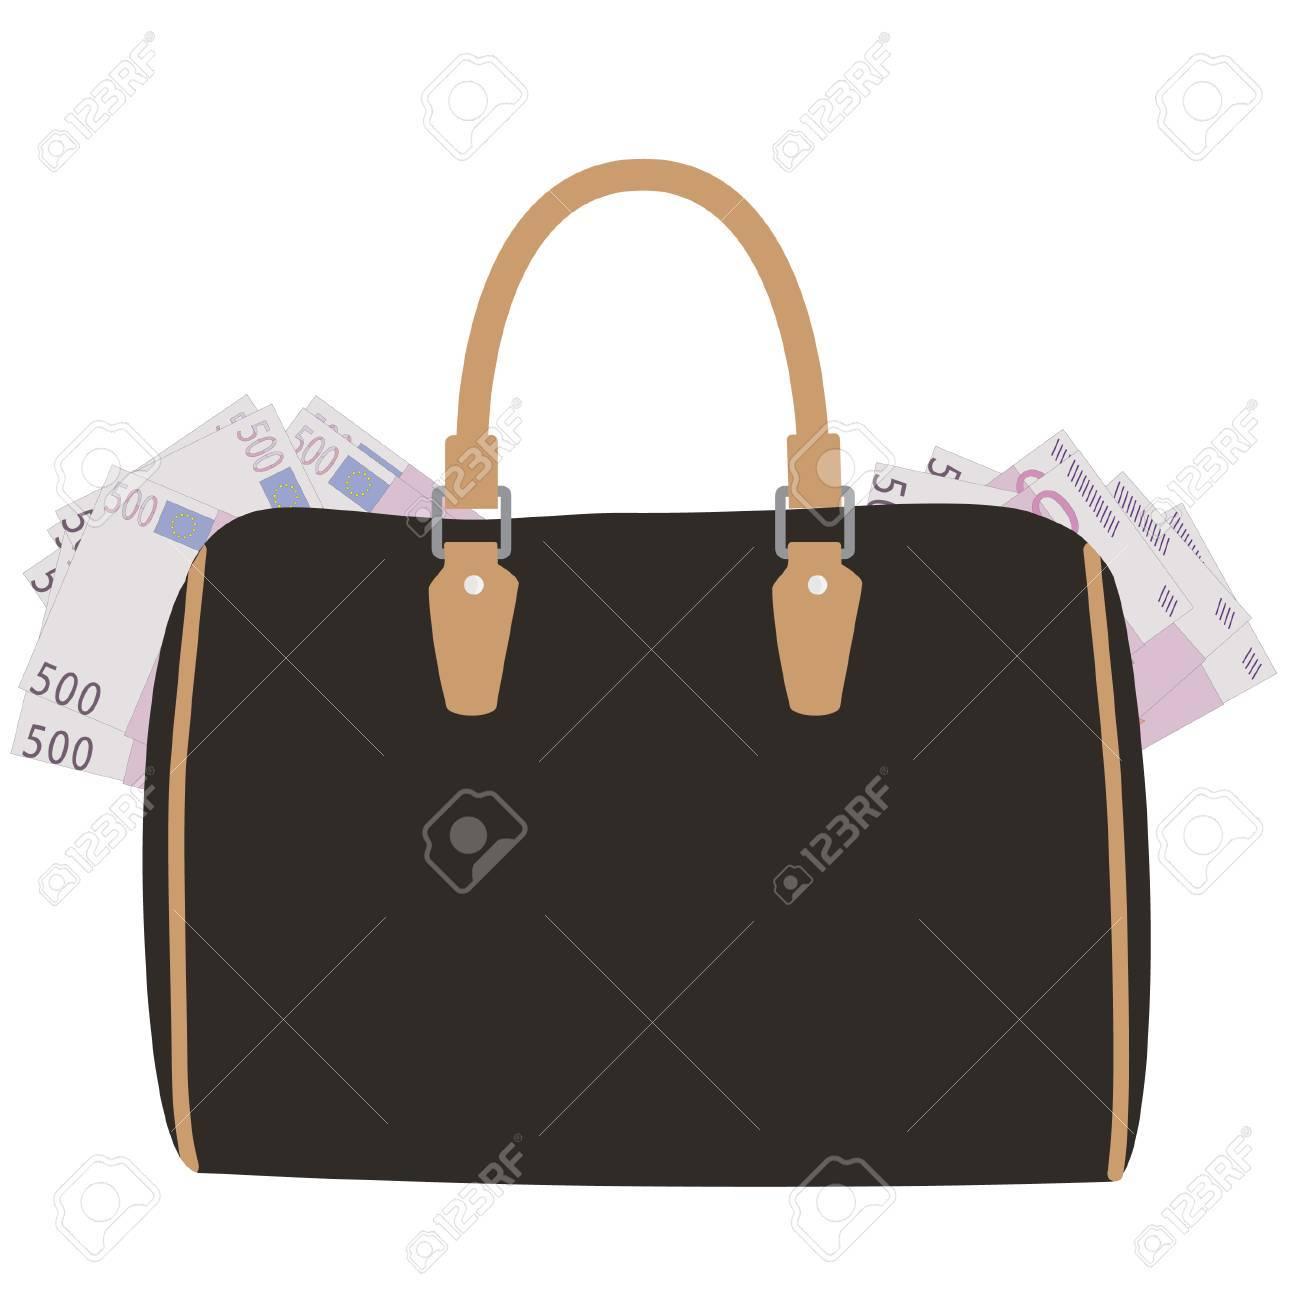 2add5b621454 Brown leather handbag with lot of money raster illustration. Five hundred  euro. Money bag